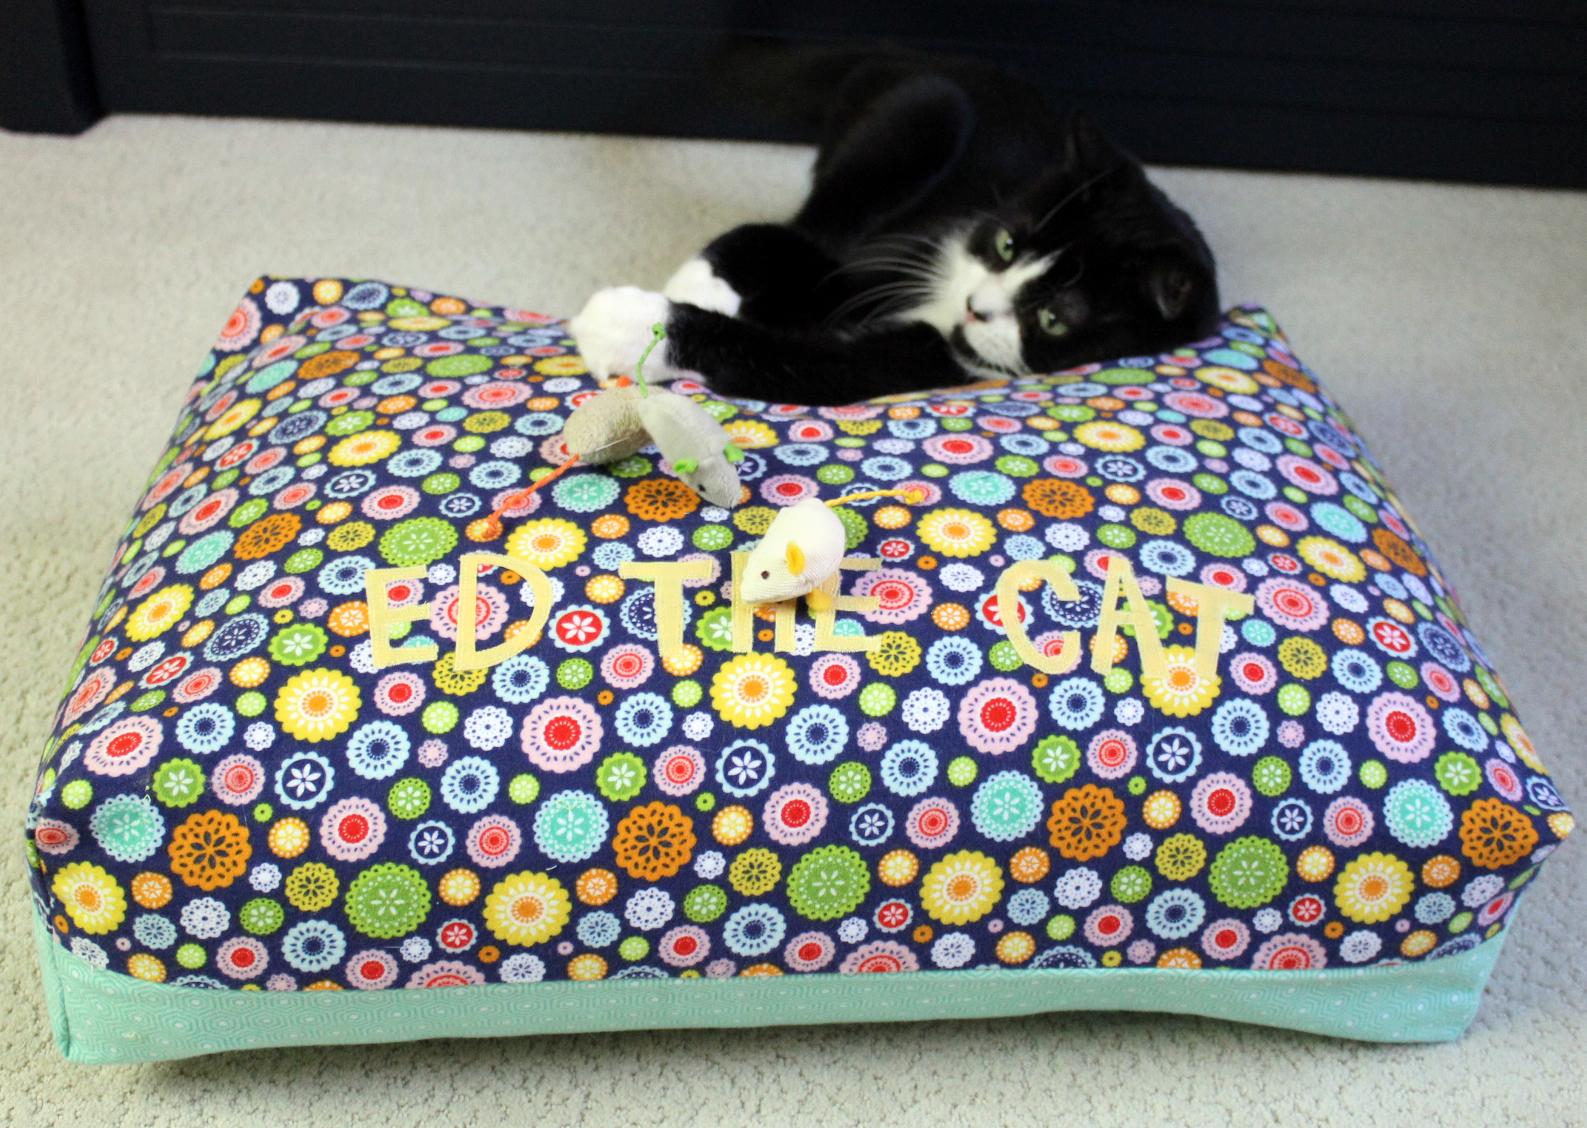 Flannel pet bed tutorial its reversible karin jordan studio ed the cat bed 3 jeuxipadfo Gallery